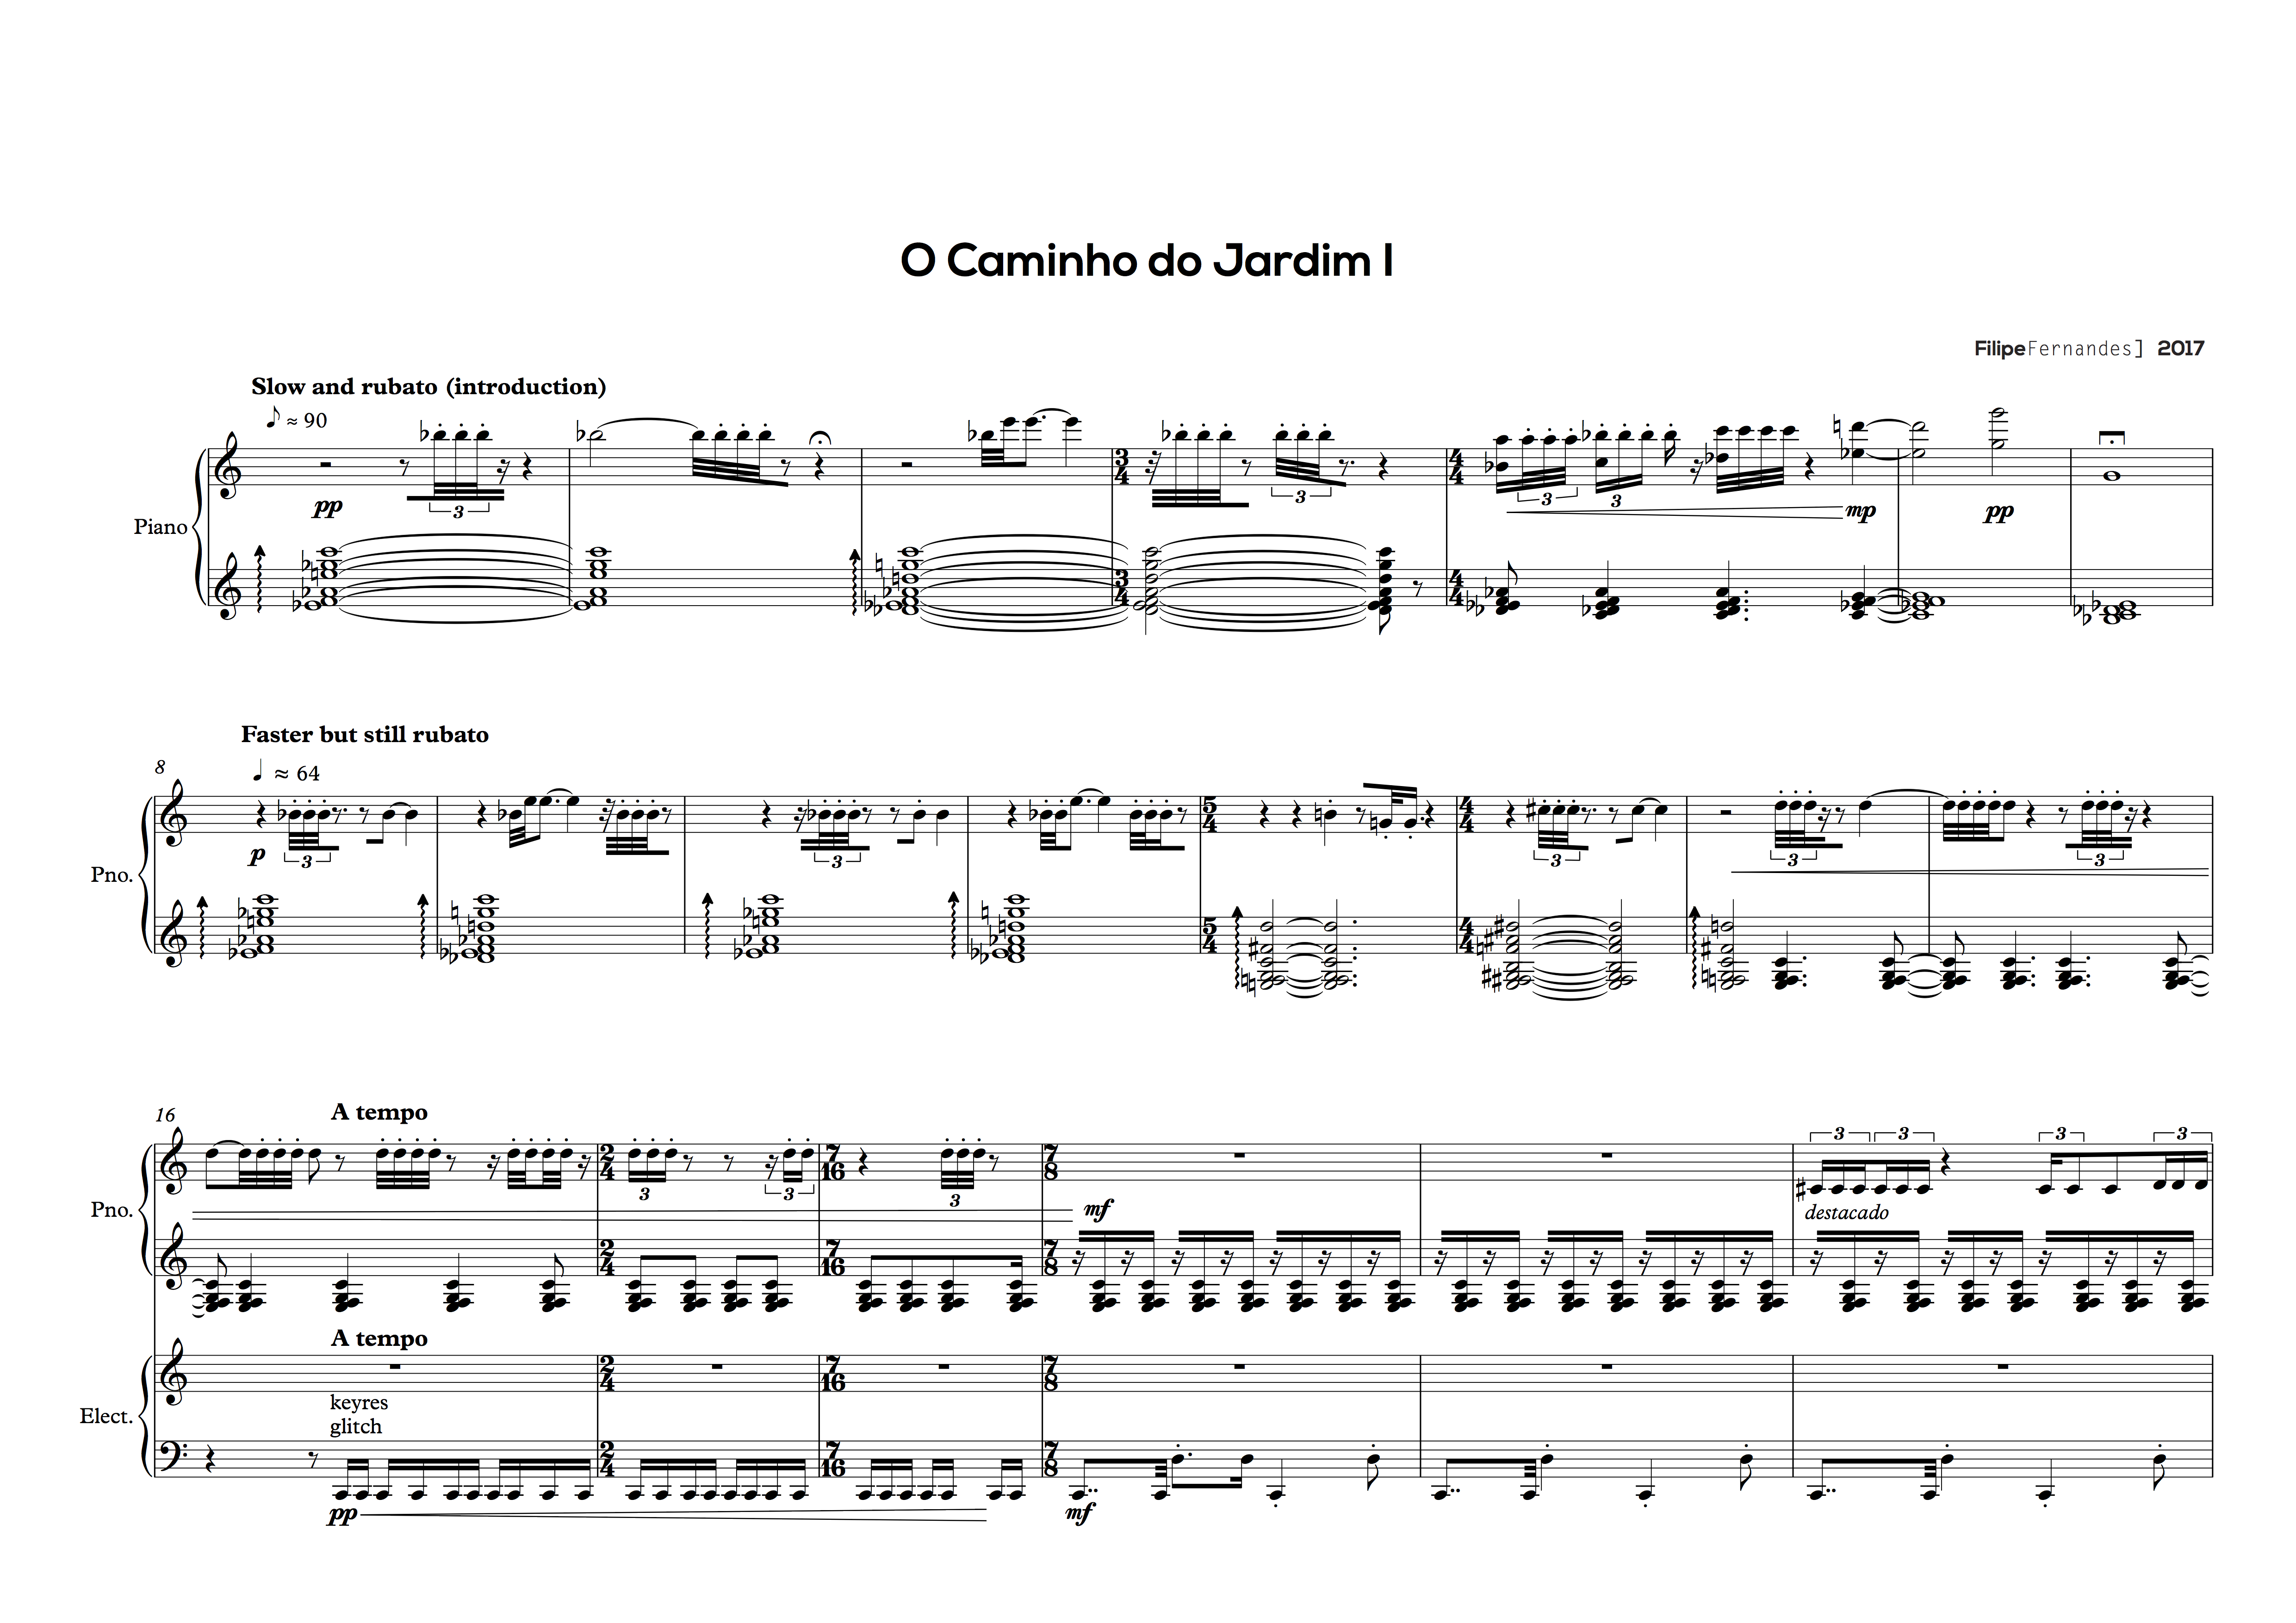 Transcription, Score Editing and Arrangement